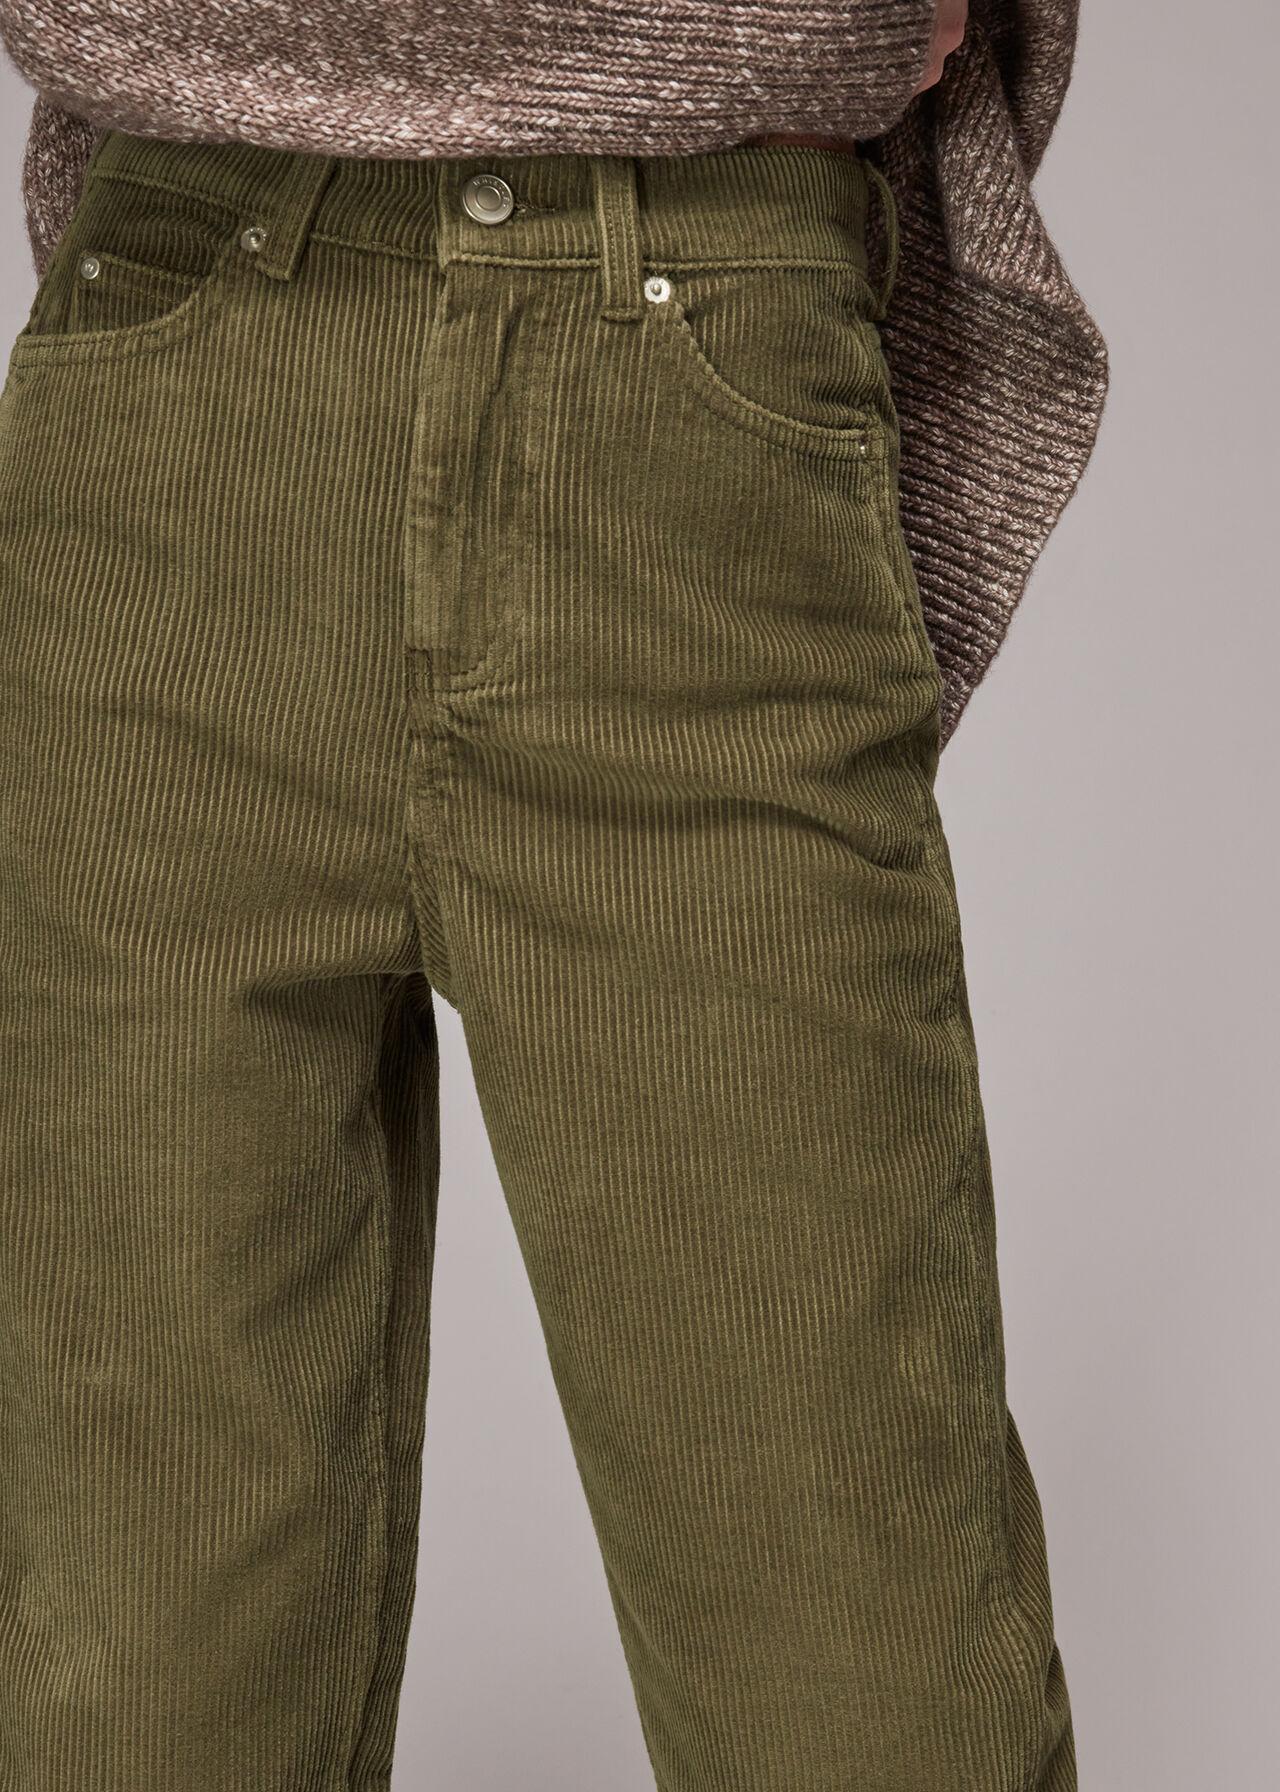 High Waist Cord Barrel Jean